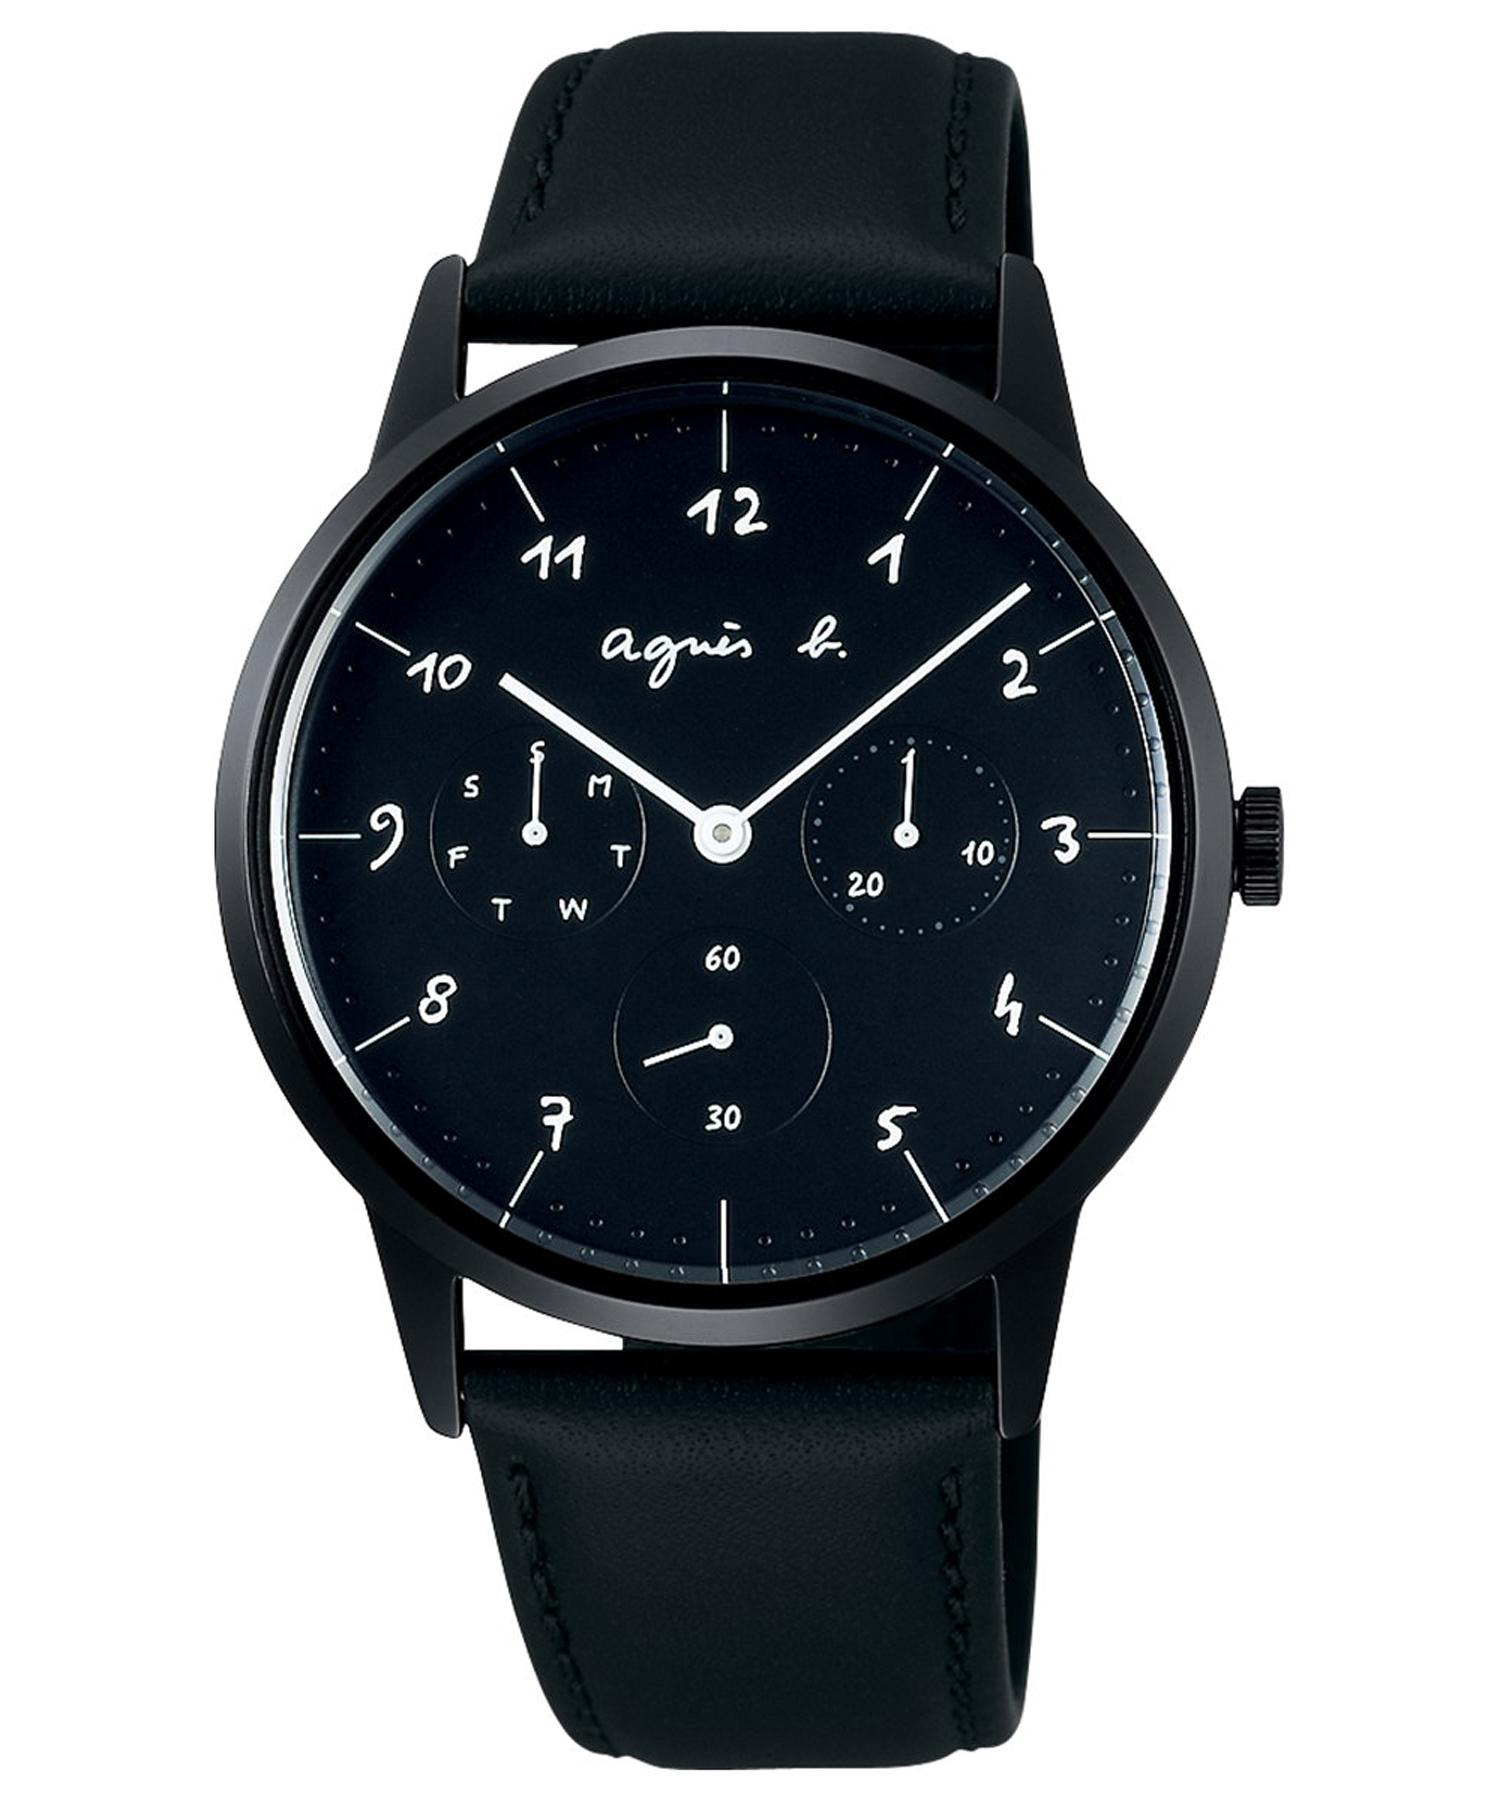 LM02 WATCH FBRT971 時計